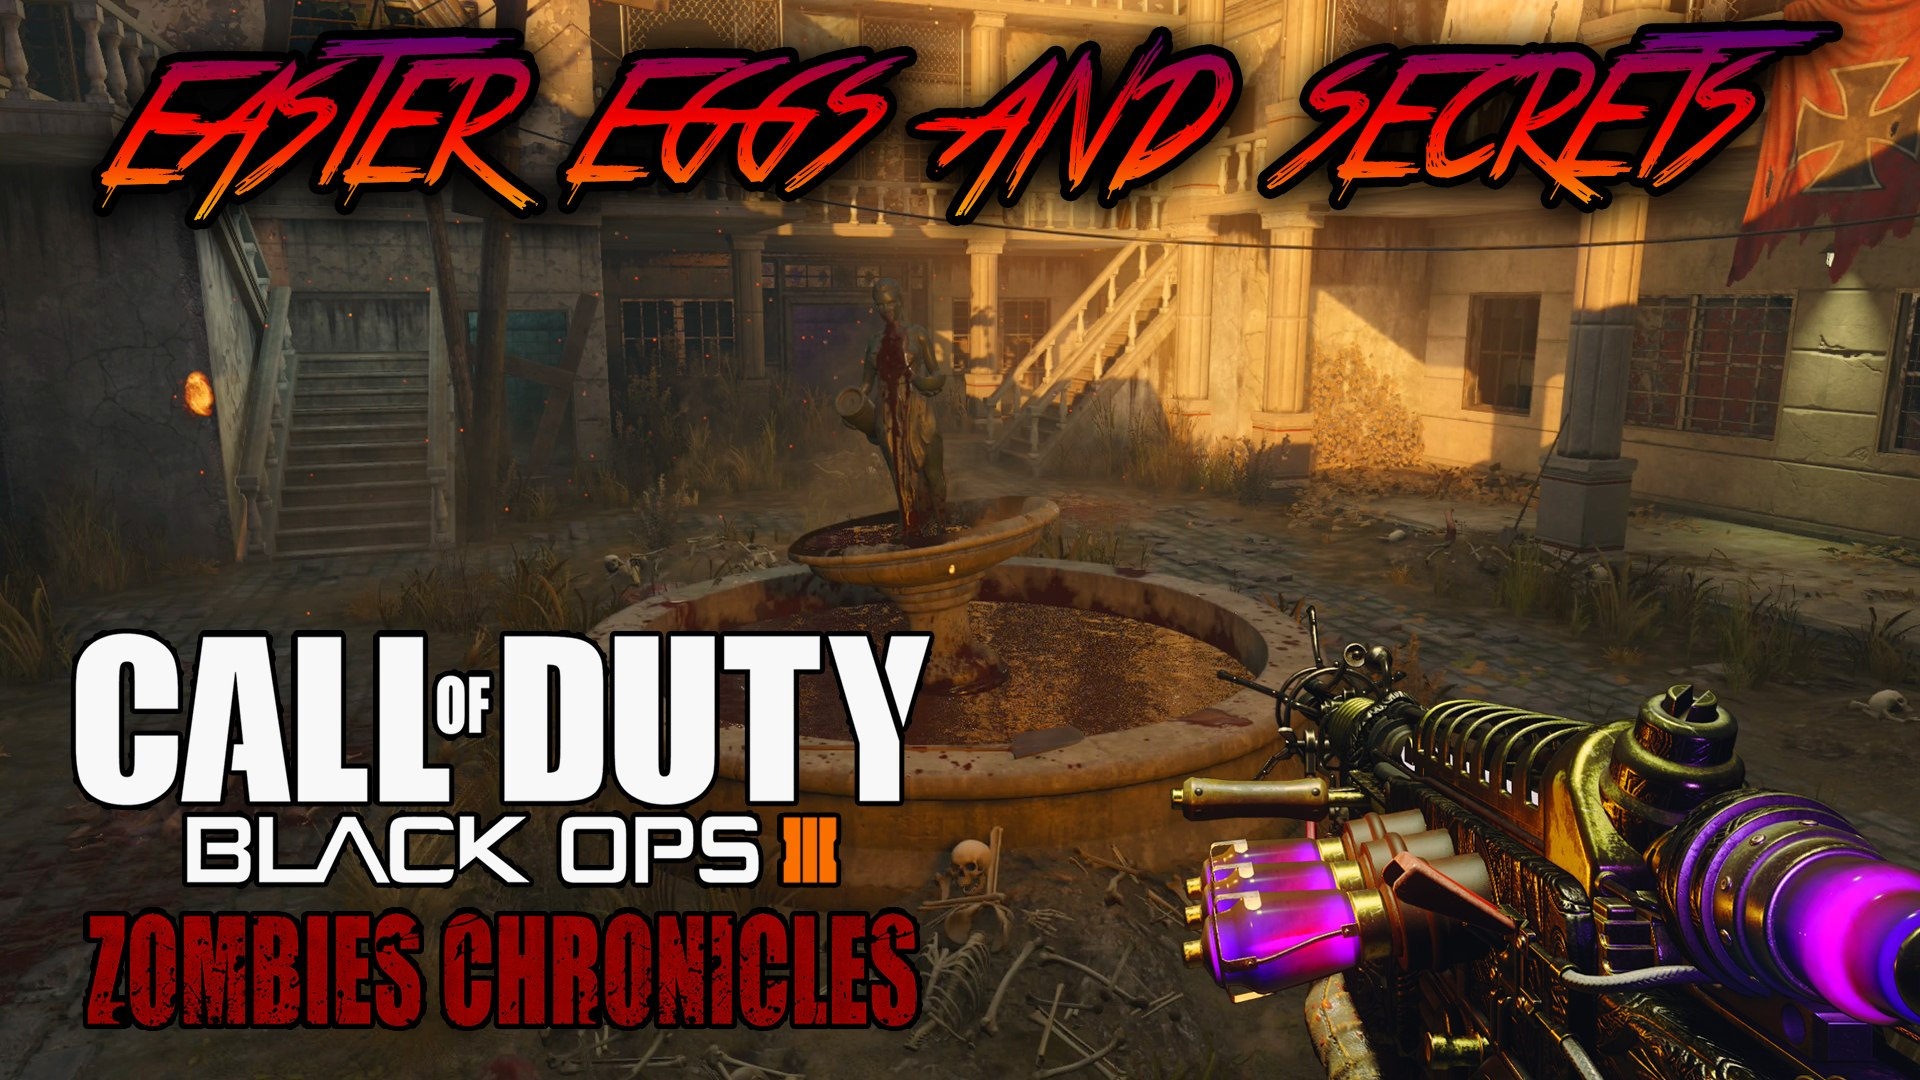 VERRUCKT - ALL EASTER EGGS AND SECRETS WALKTHROUGH (Black Ops 3 Zombies  Chronicles)